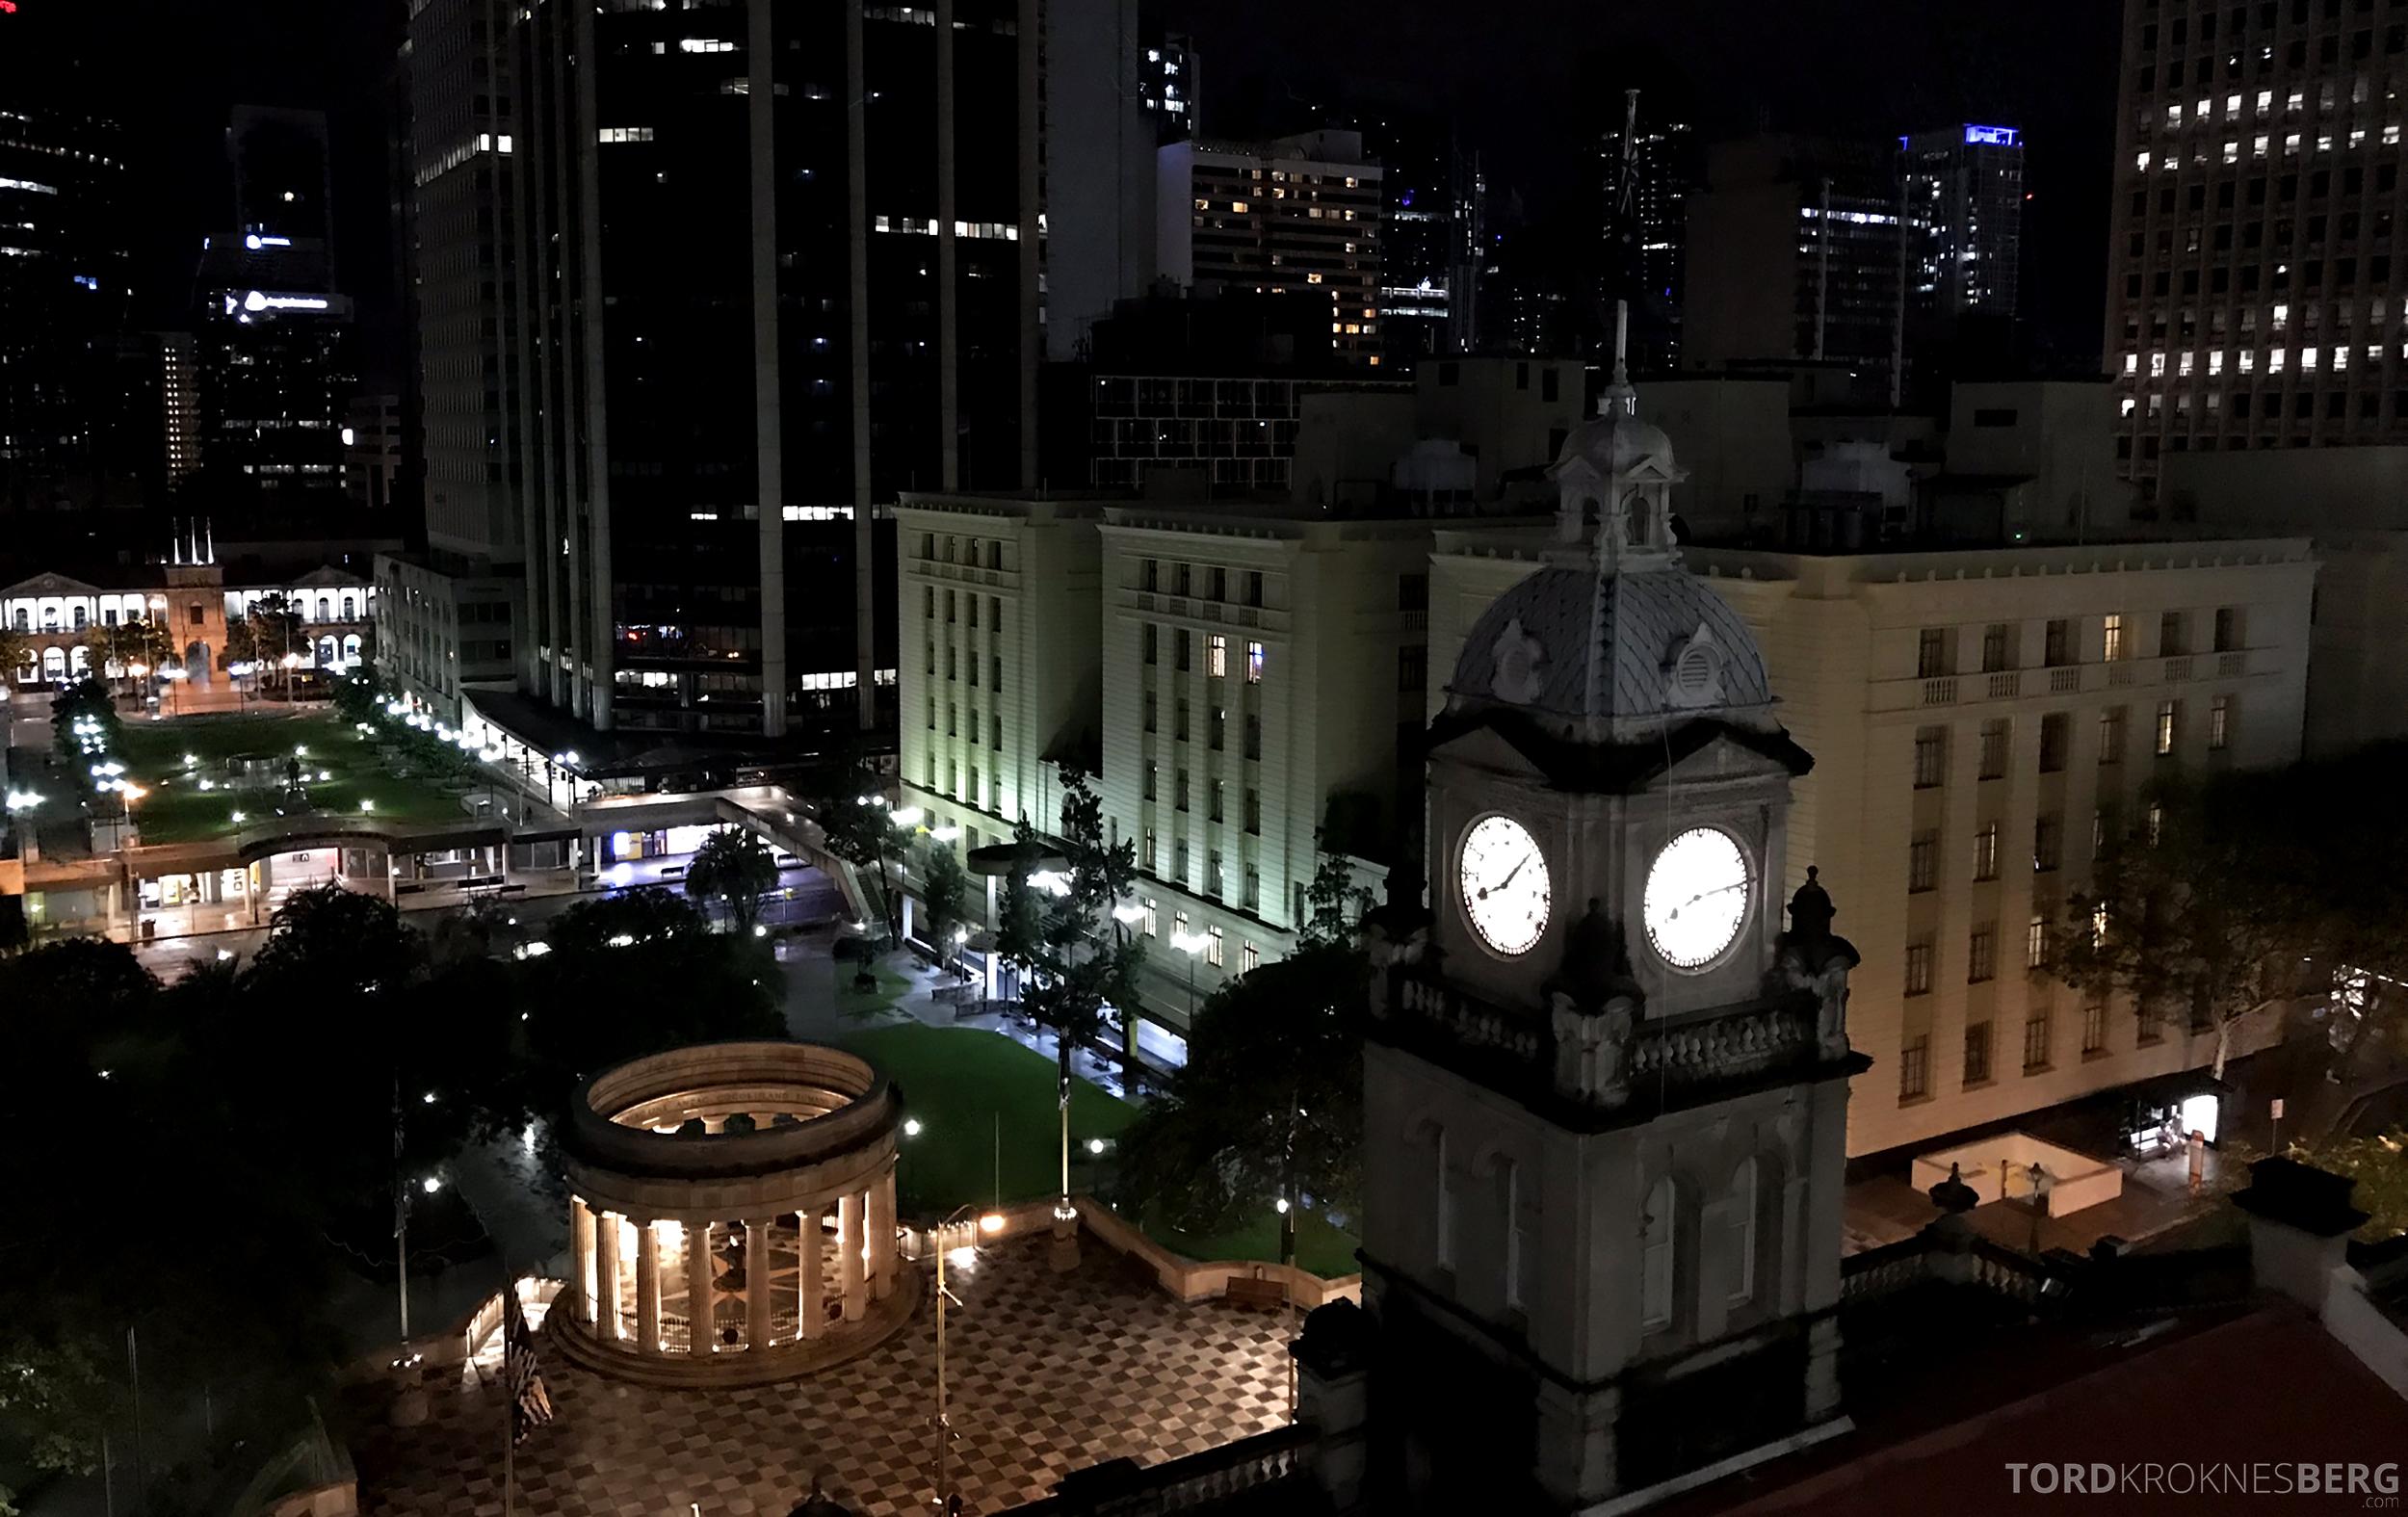 Sofitel Hotel Brisbane utsikt natt